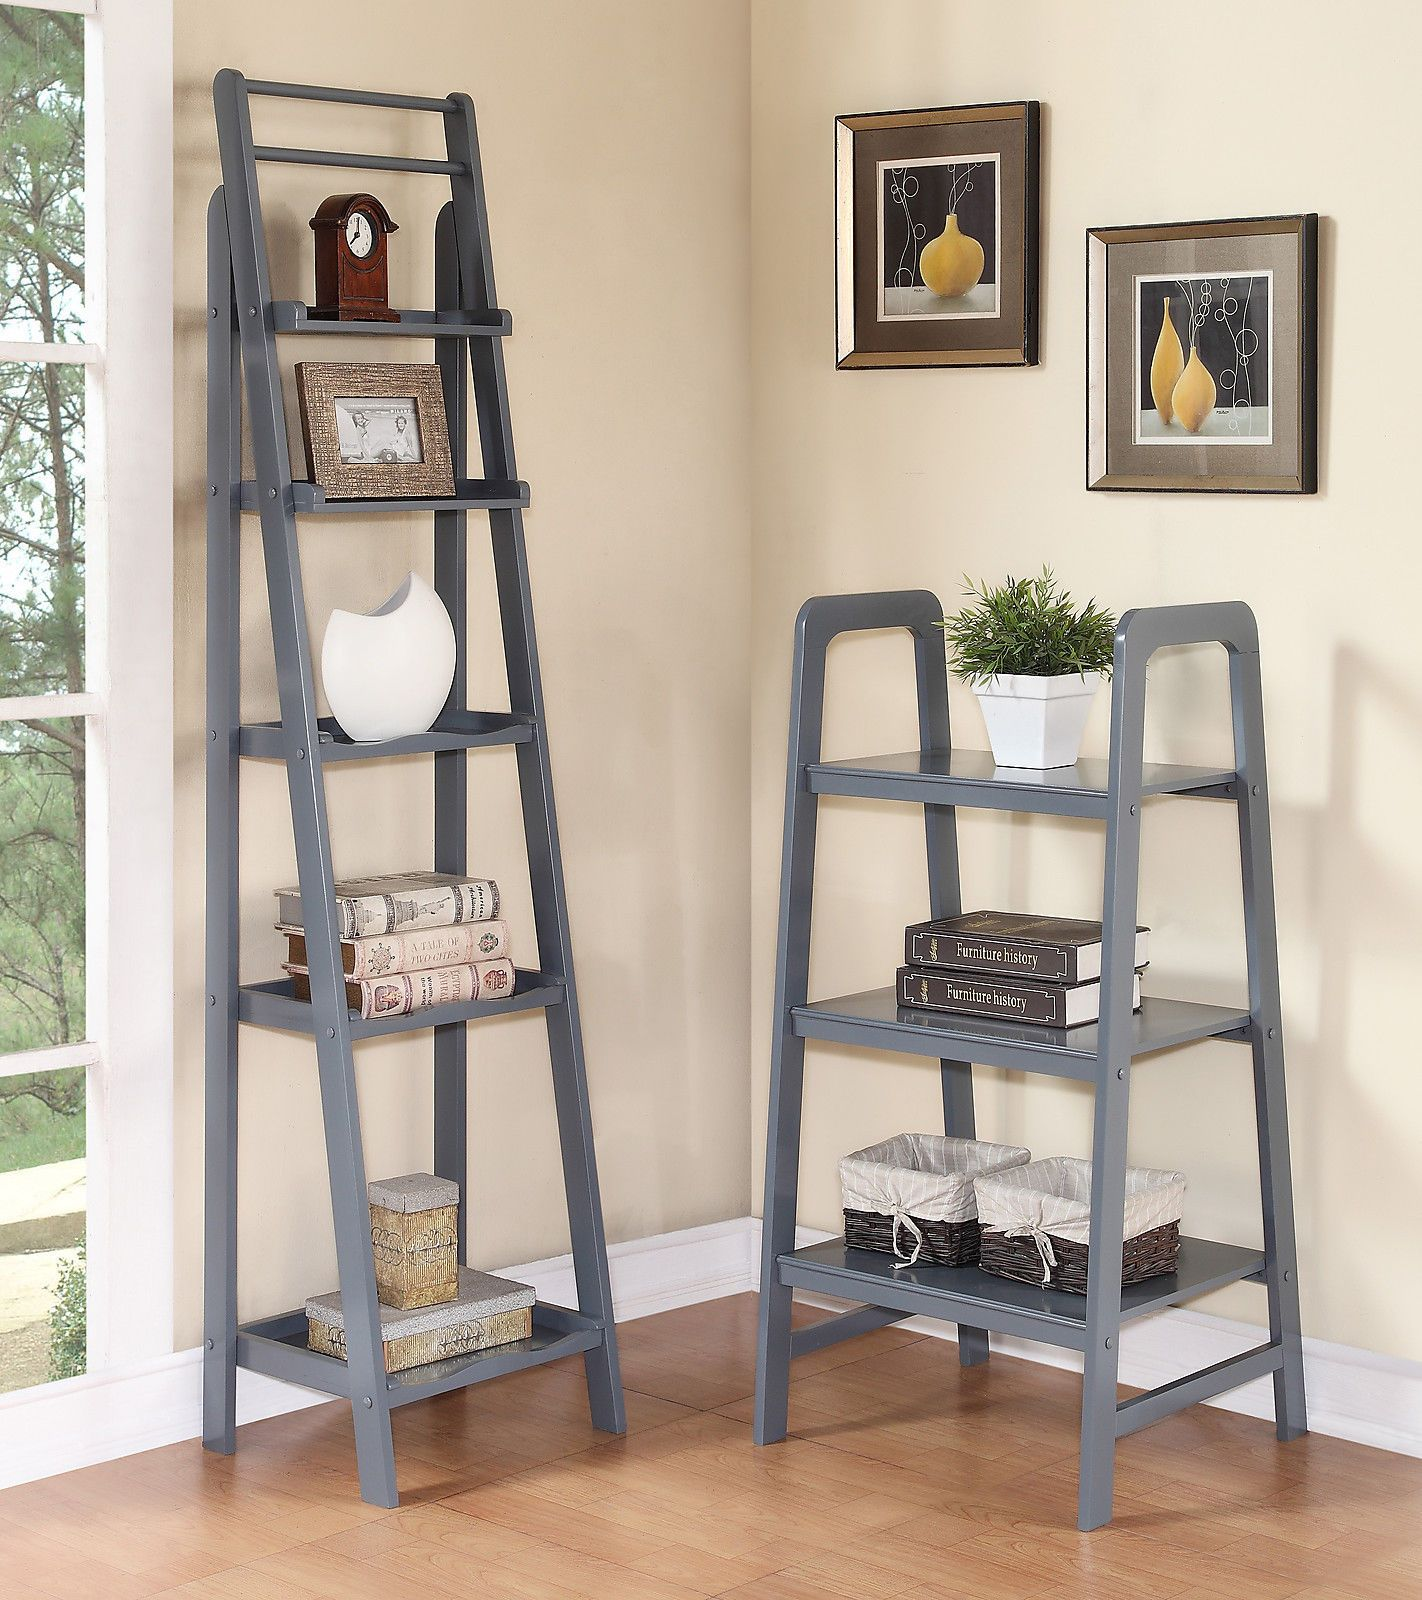 Ladder Display Rack